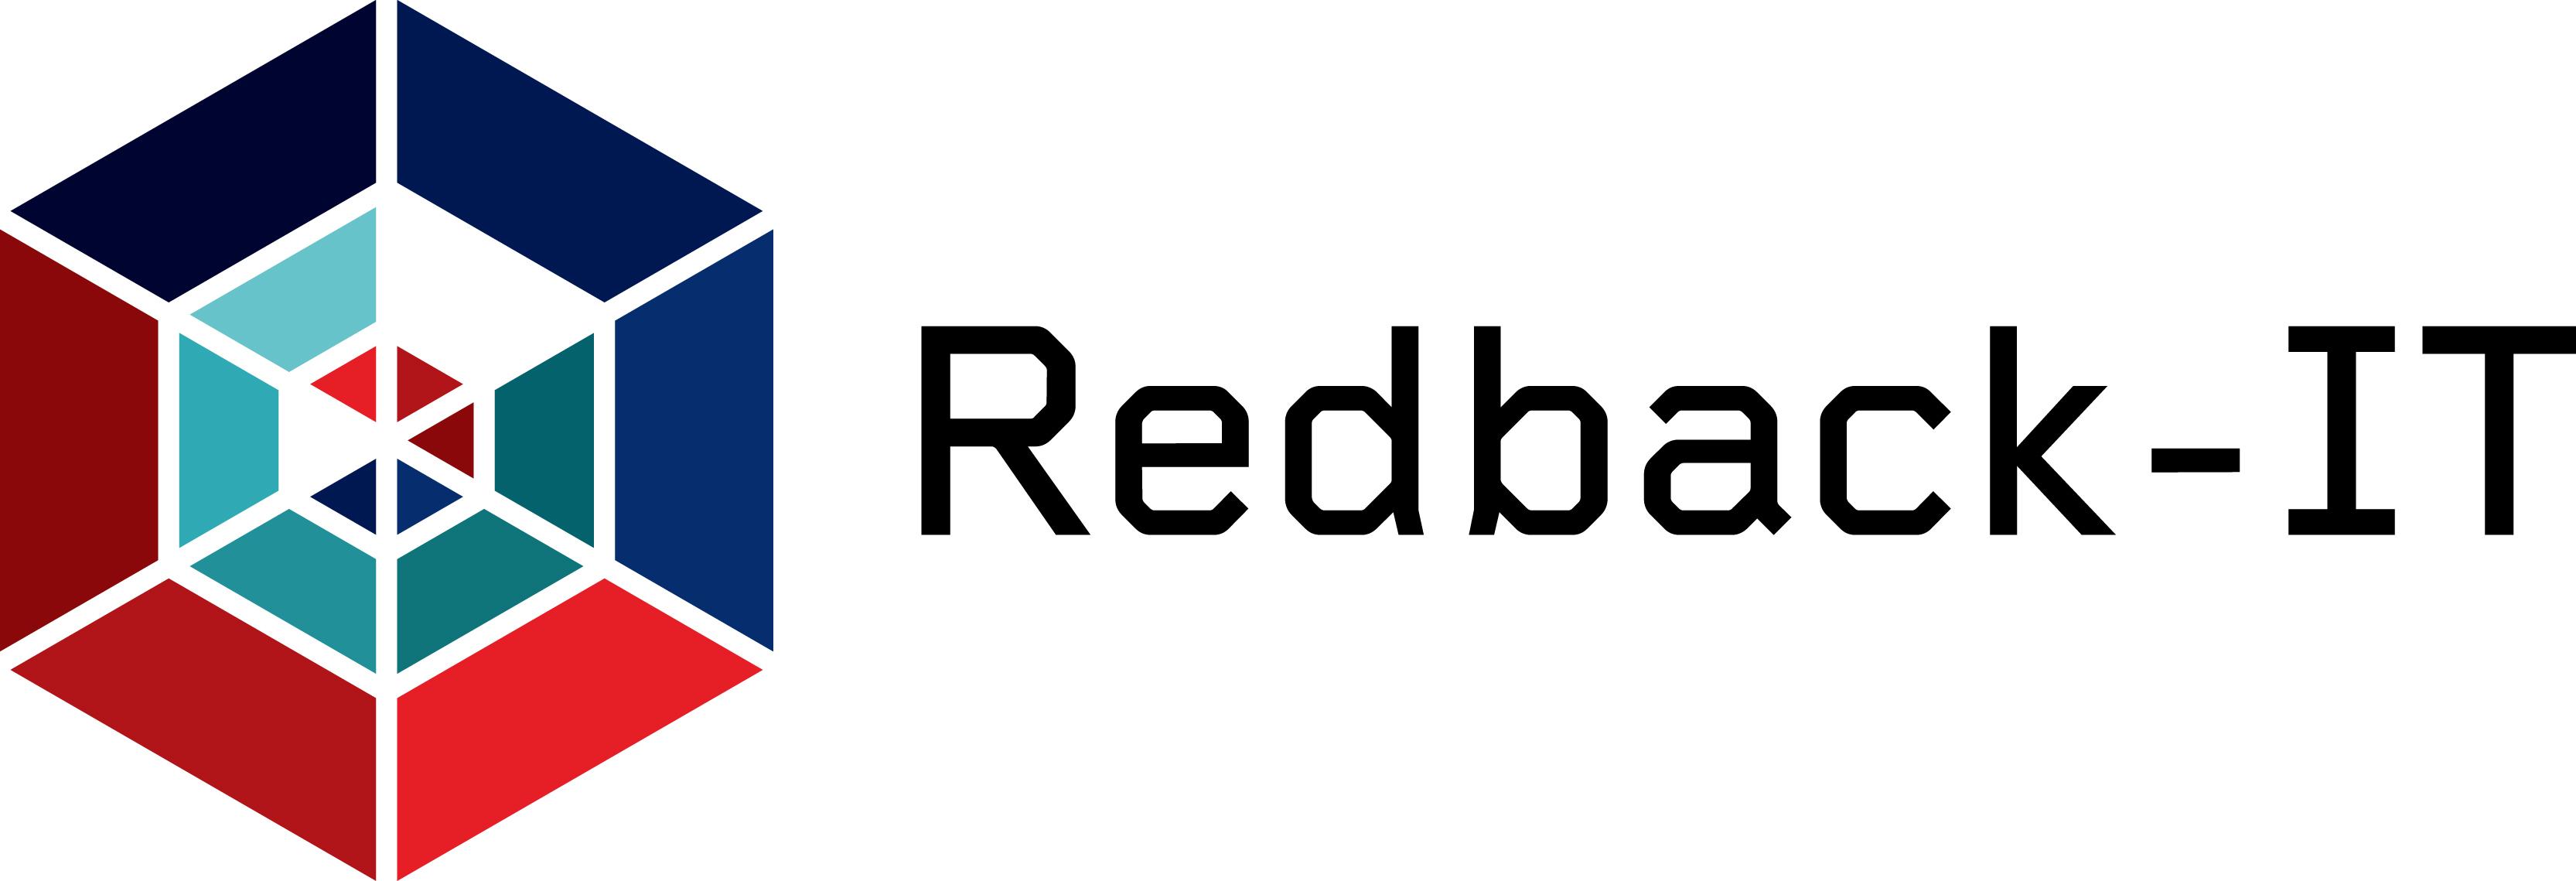 Redback-IT